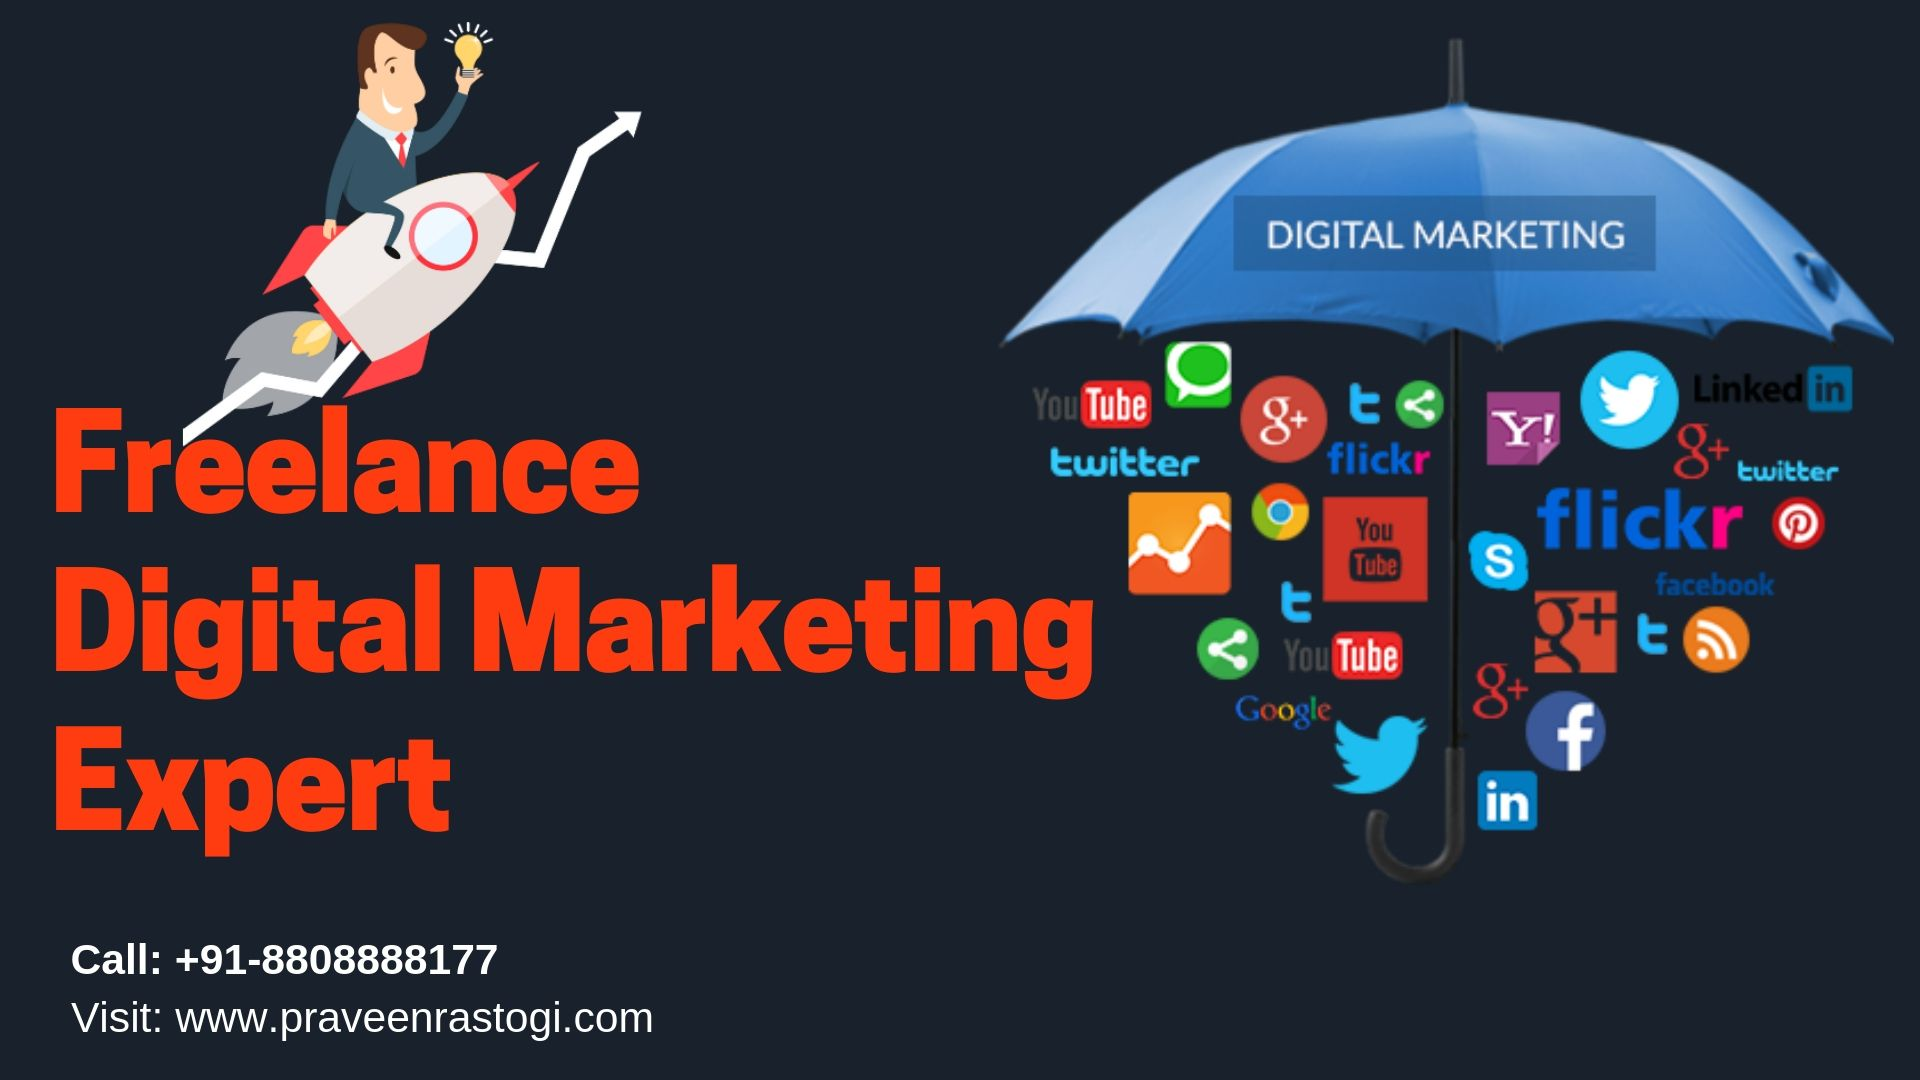 Freelance Digital Marketing Expert Digital Marketing Digital Marketing